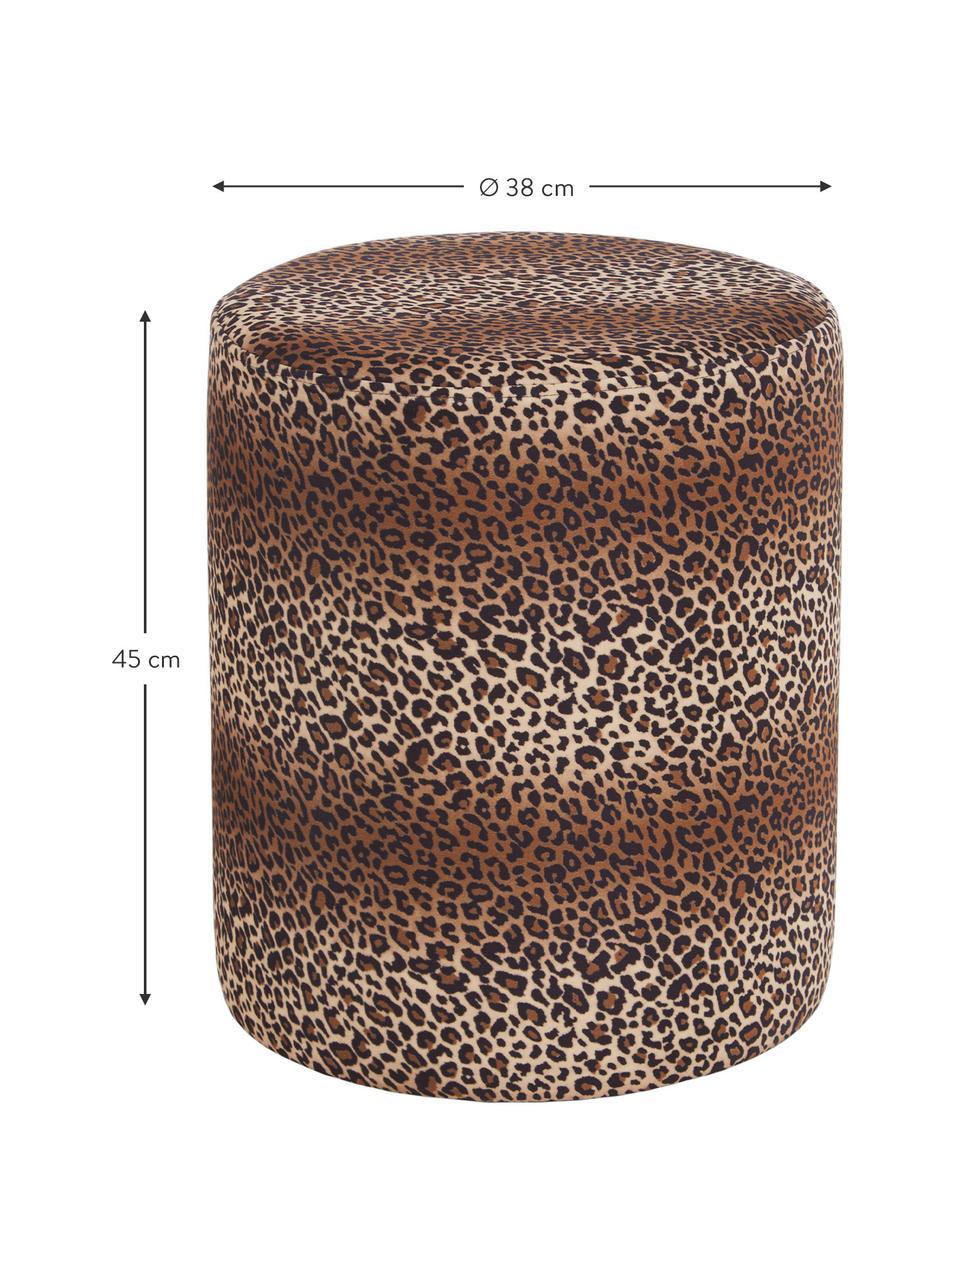 Samt-Hocker Daisy mit braunem Leo-Muster, Bezug: Samt (Polyester) Der hoch, Rahmen: Sperrholz, Samt Leoprint, Ø 38 x H 45 cm